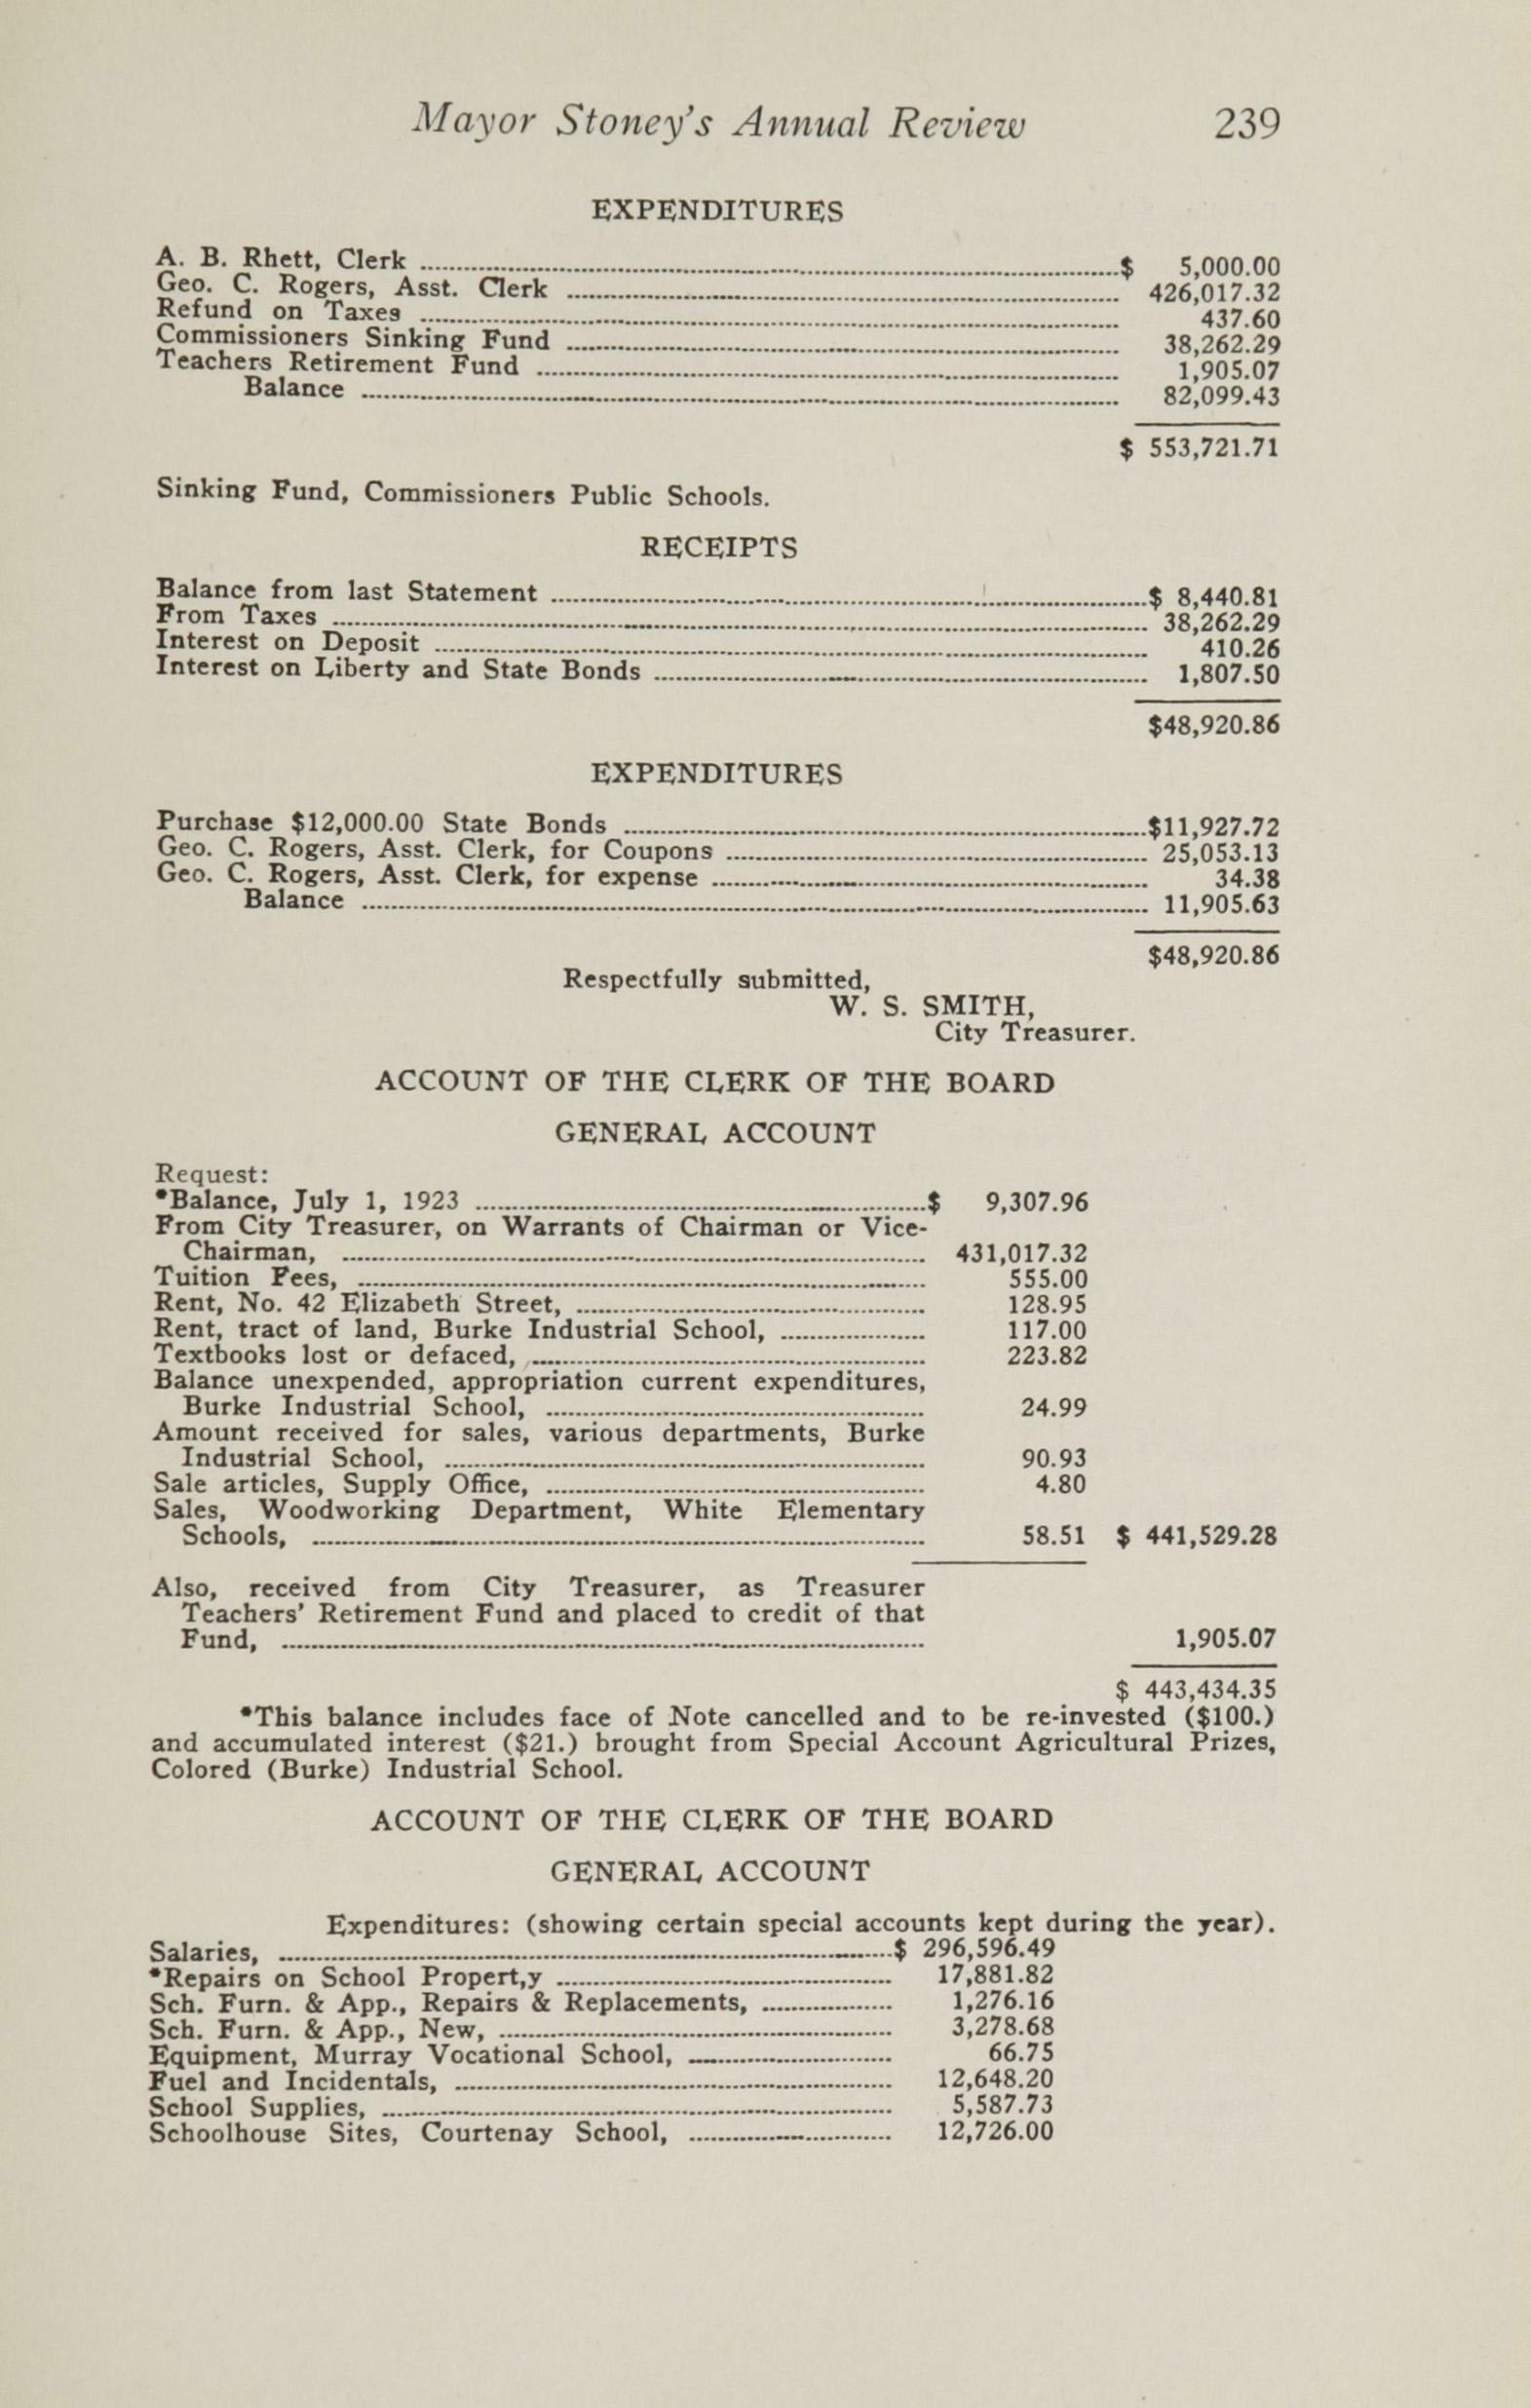 Charleston Yearbook, 1924, page 239